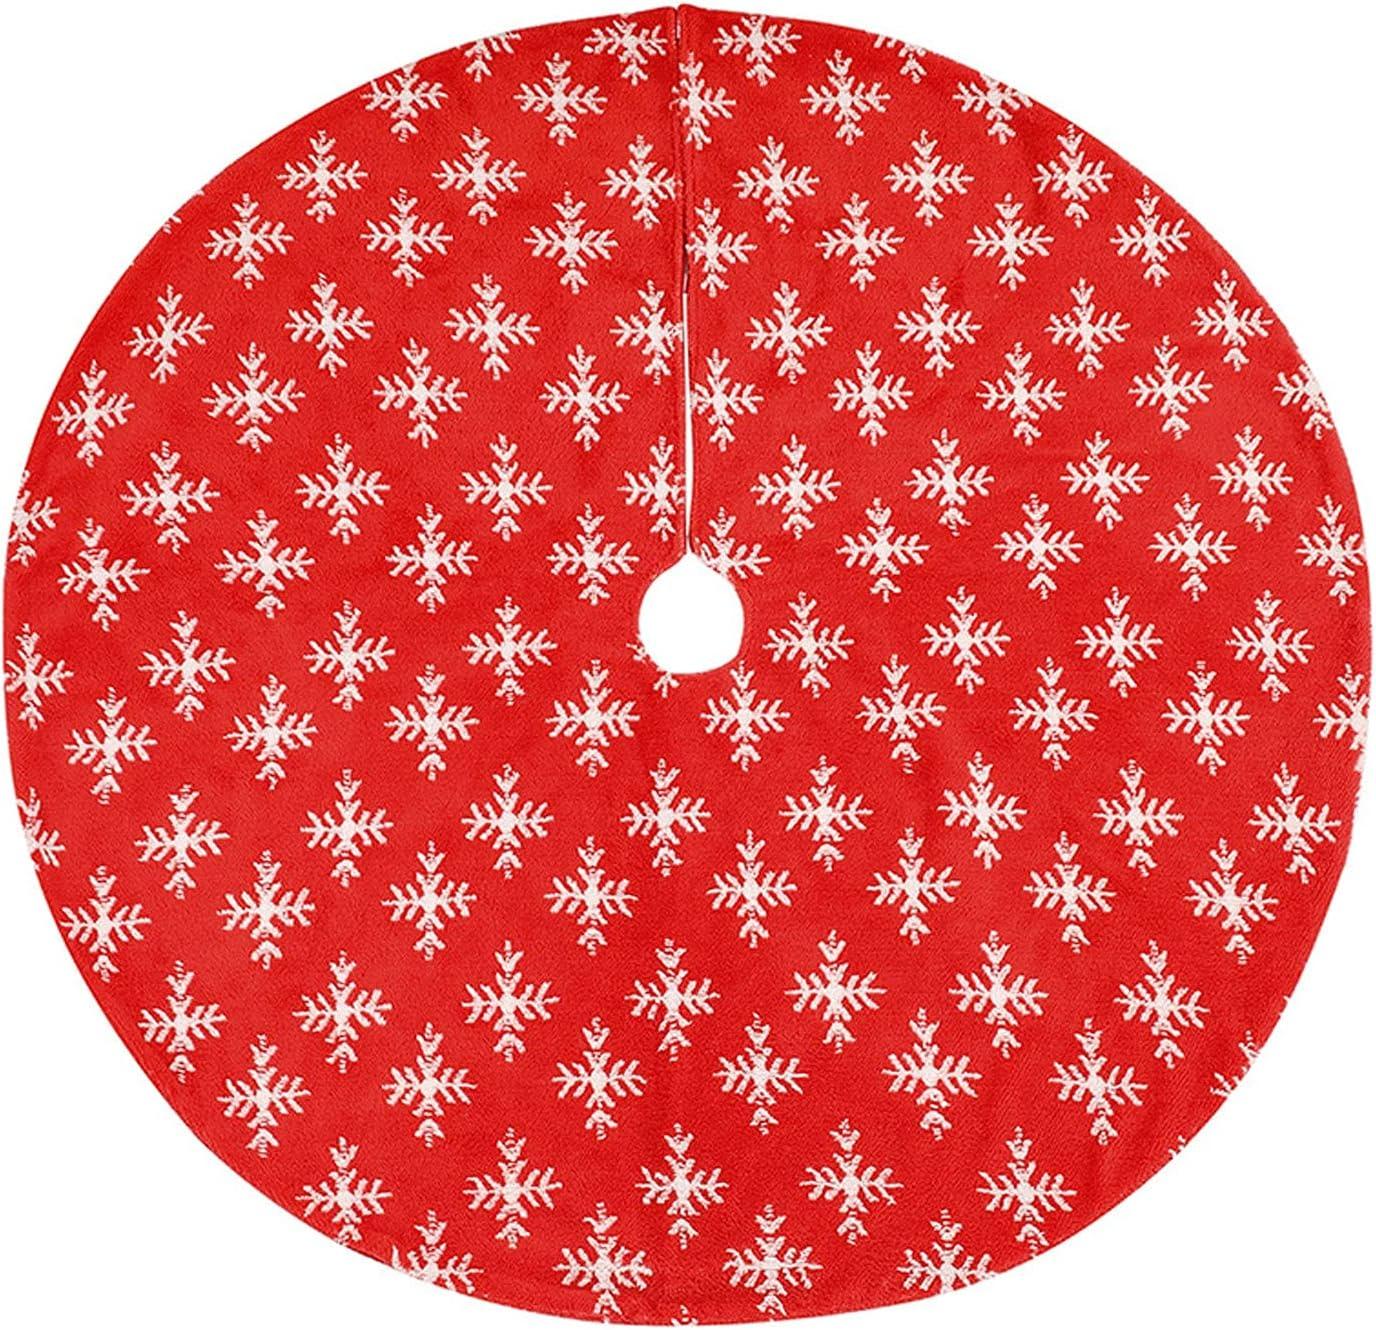 QYYYUNDING Snowflake Christmas Tree 2021 spring and summer new Plush Skirt Socks Ranking TOP15